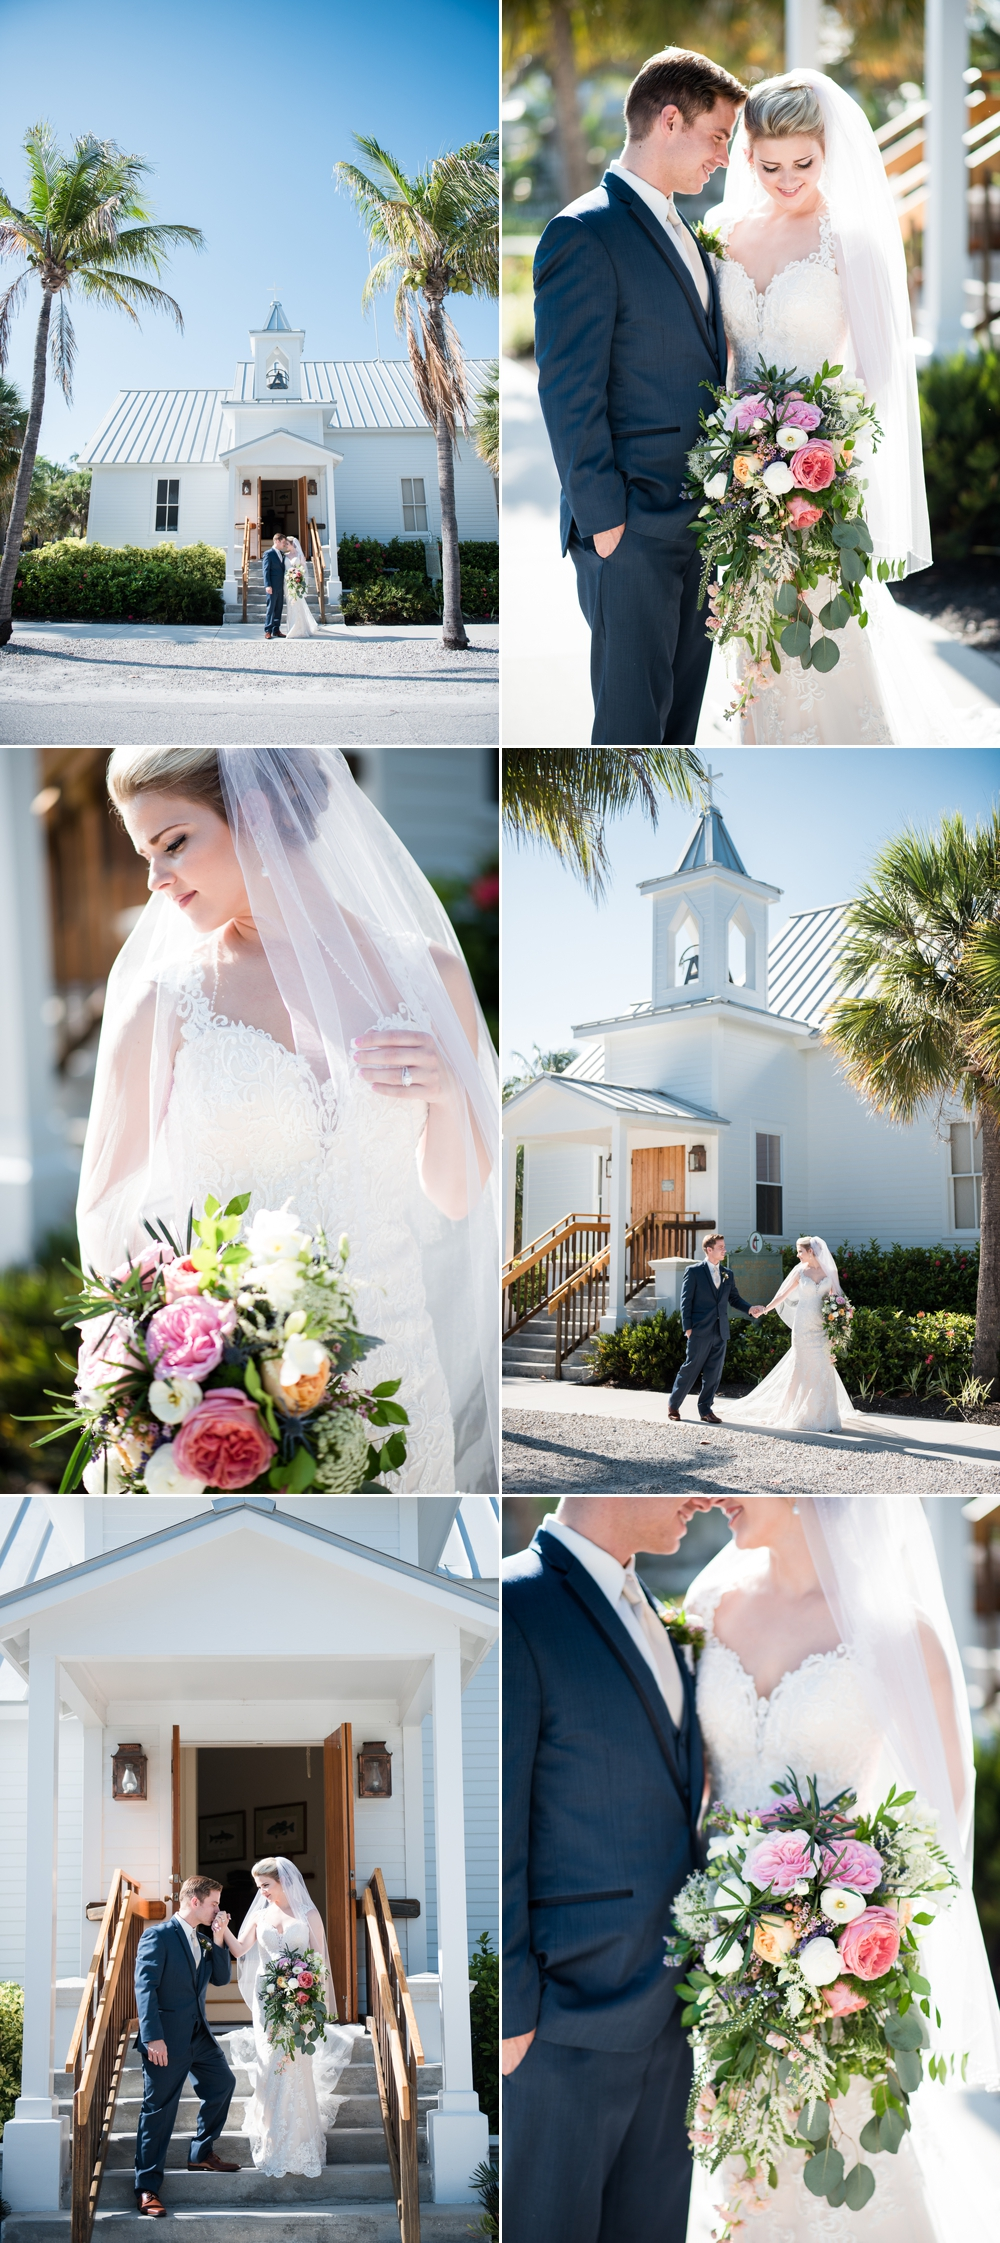 2016 HLM Wedding Beach Shoot 2.jpg